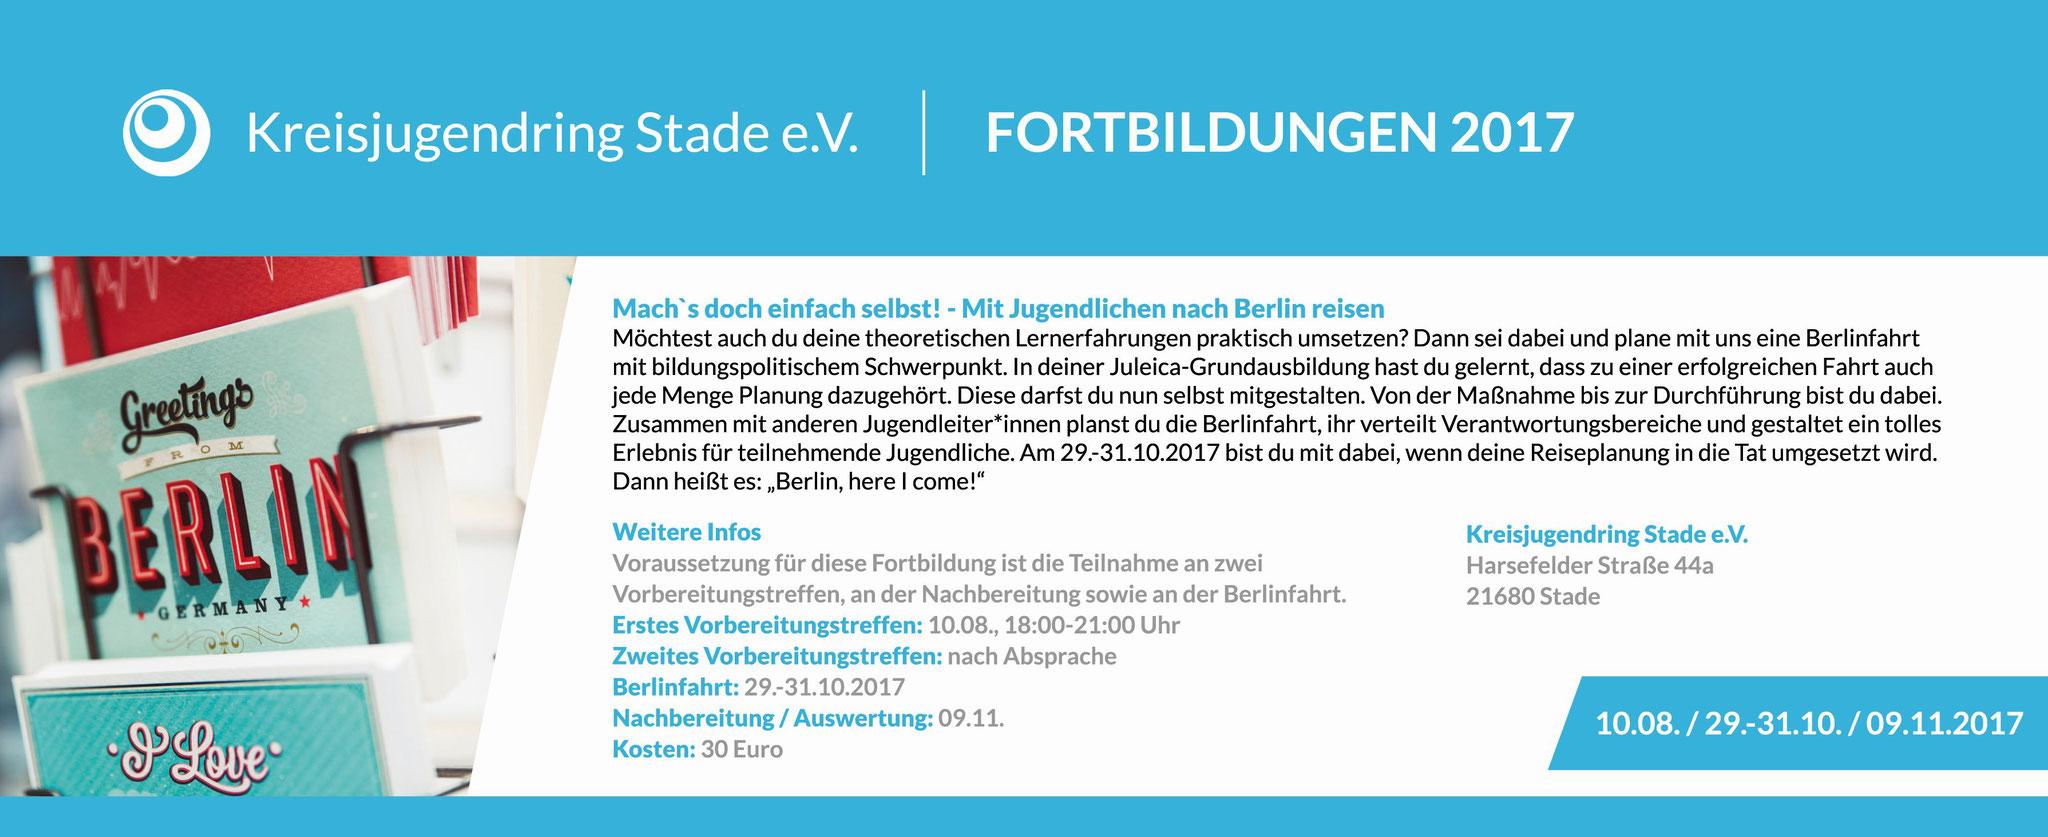 News-Archiv - Stadtjugendring Buxtehude e.V.